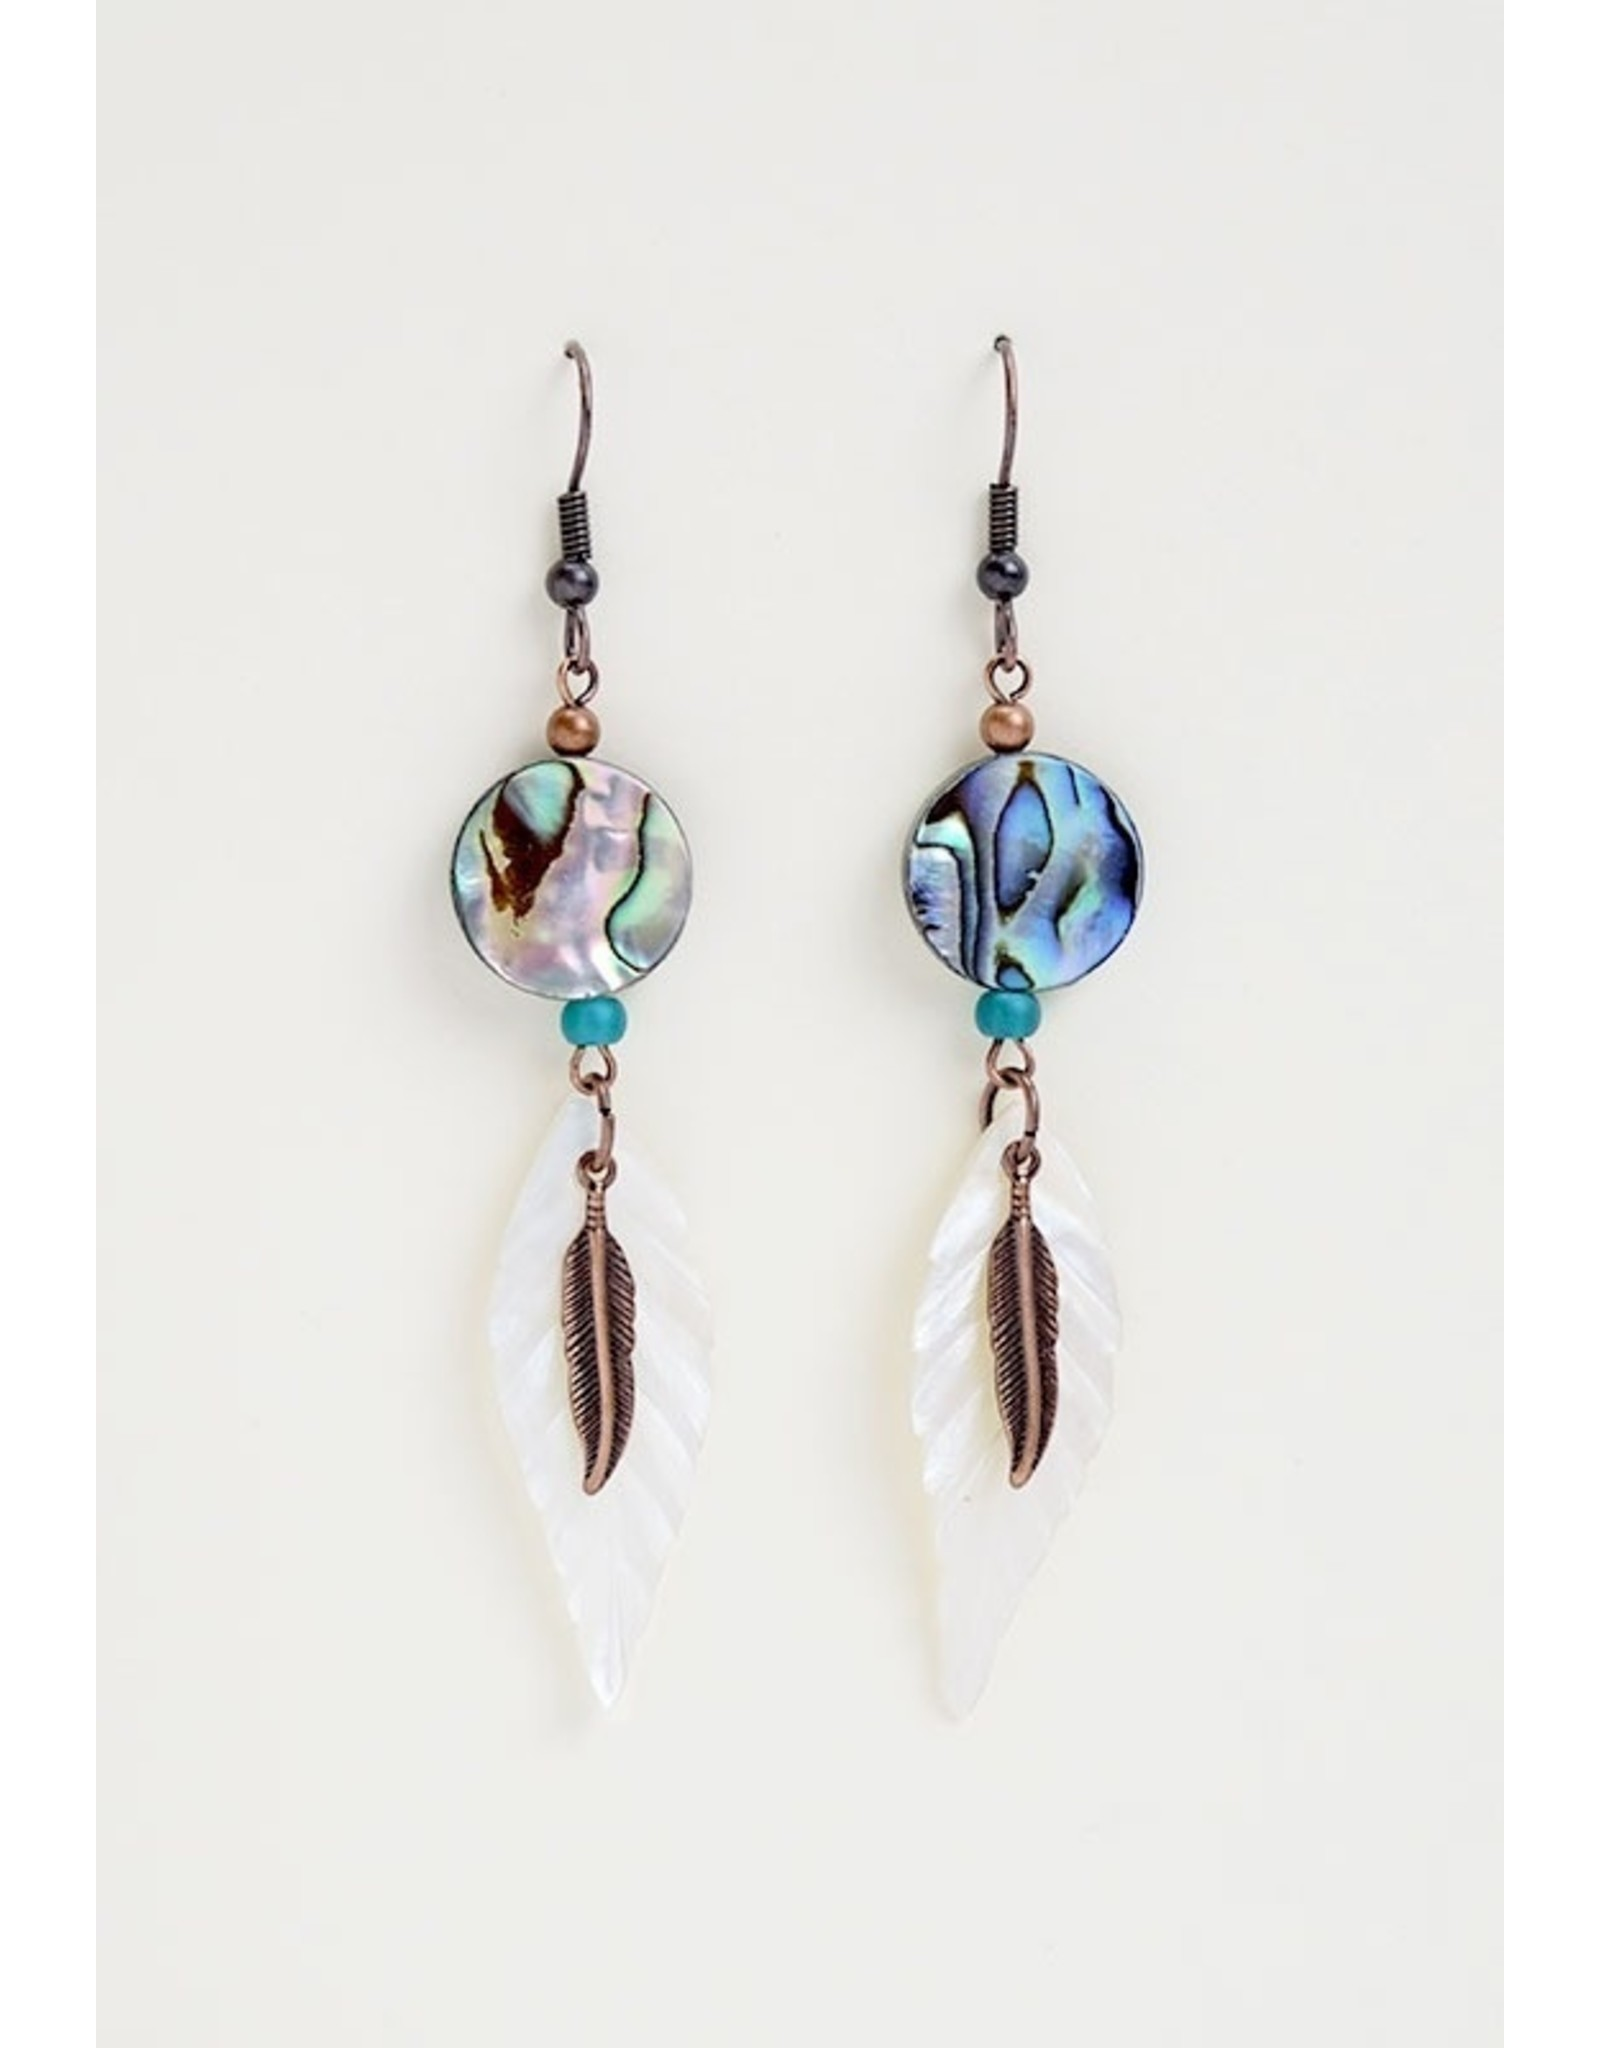 Paua Shell and Feather Earrings - ME1411